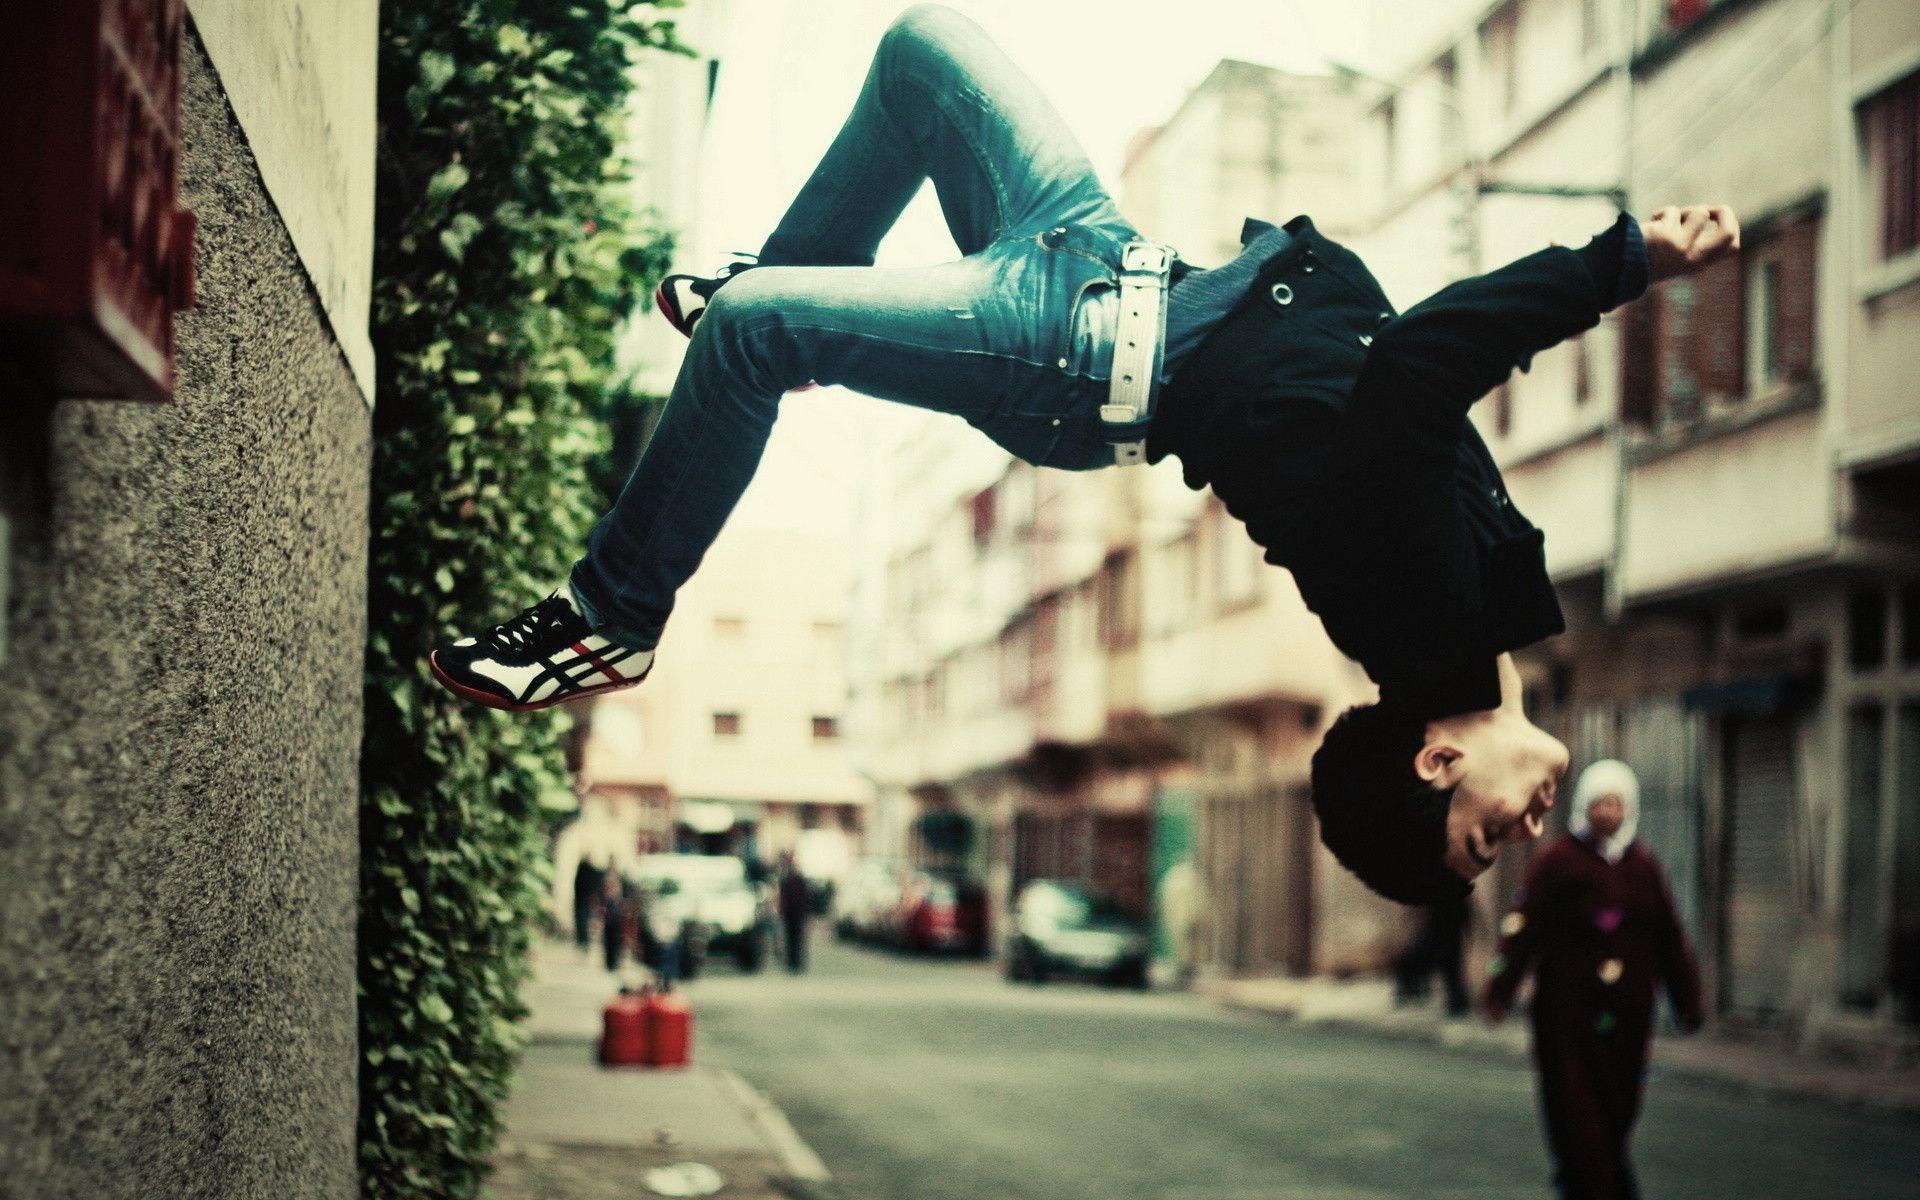 parkour wall flip - photo #1